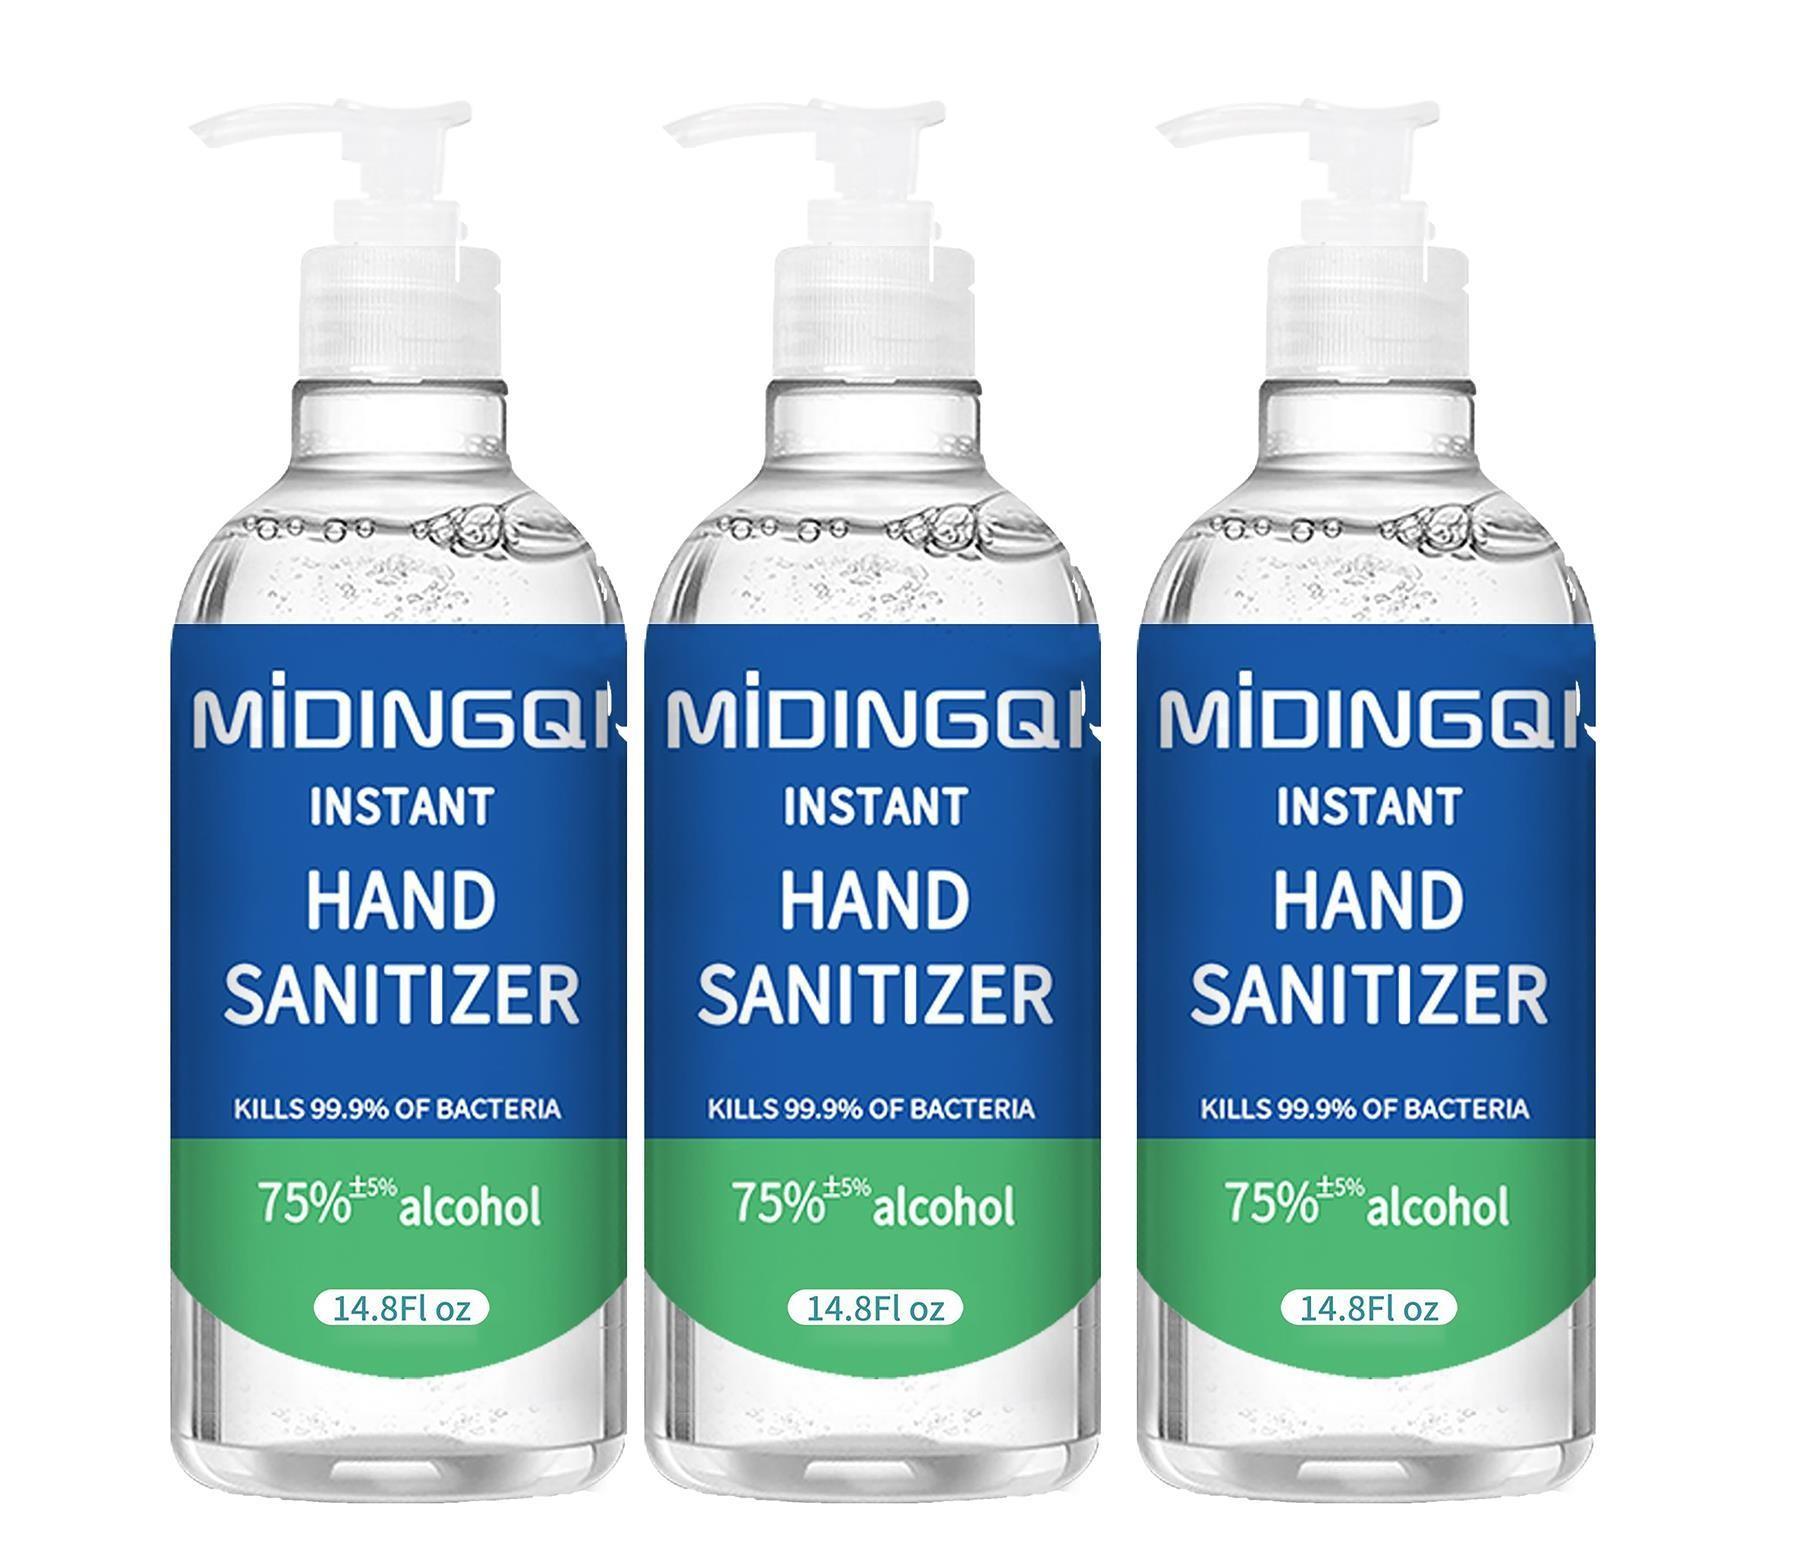 MIDINGQI Sanitiser 3 X 500 ml Hand sanitizer with 75% alcohol